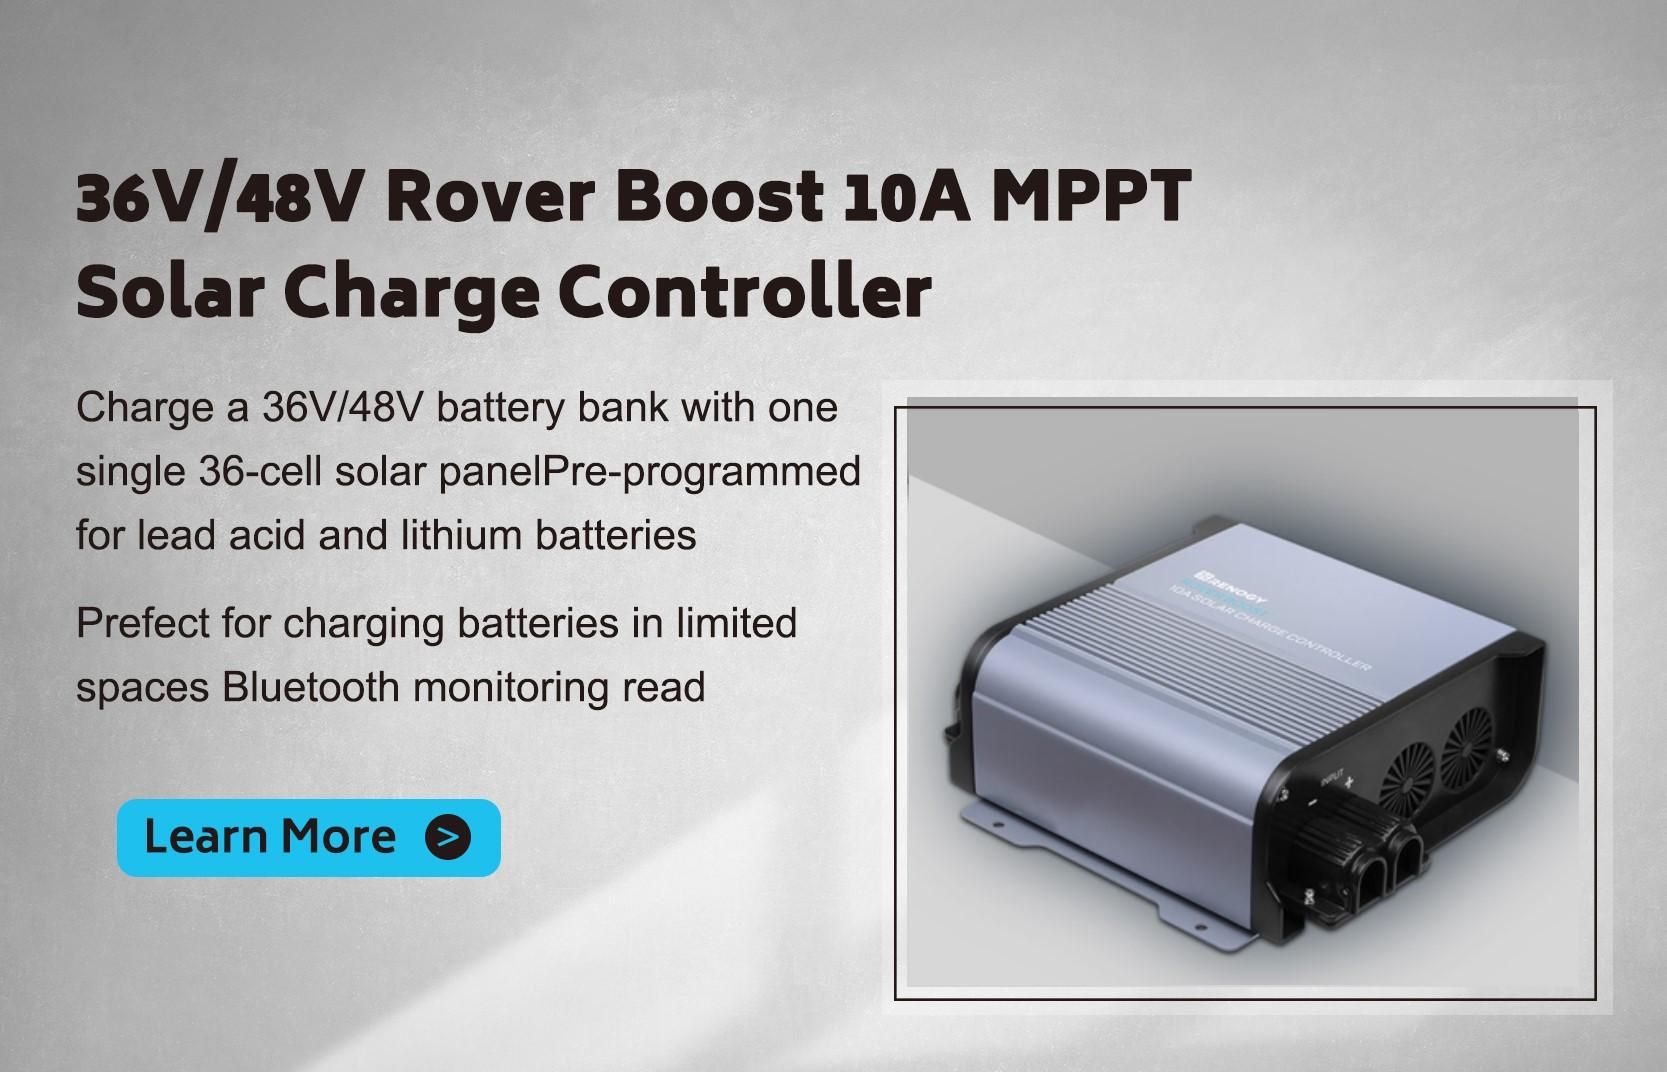 36V/48V Rover Boost 10A MPPT Solar Charge Controller